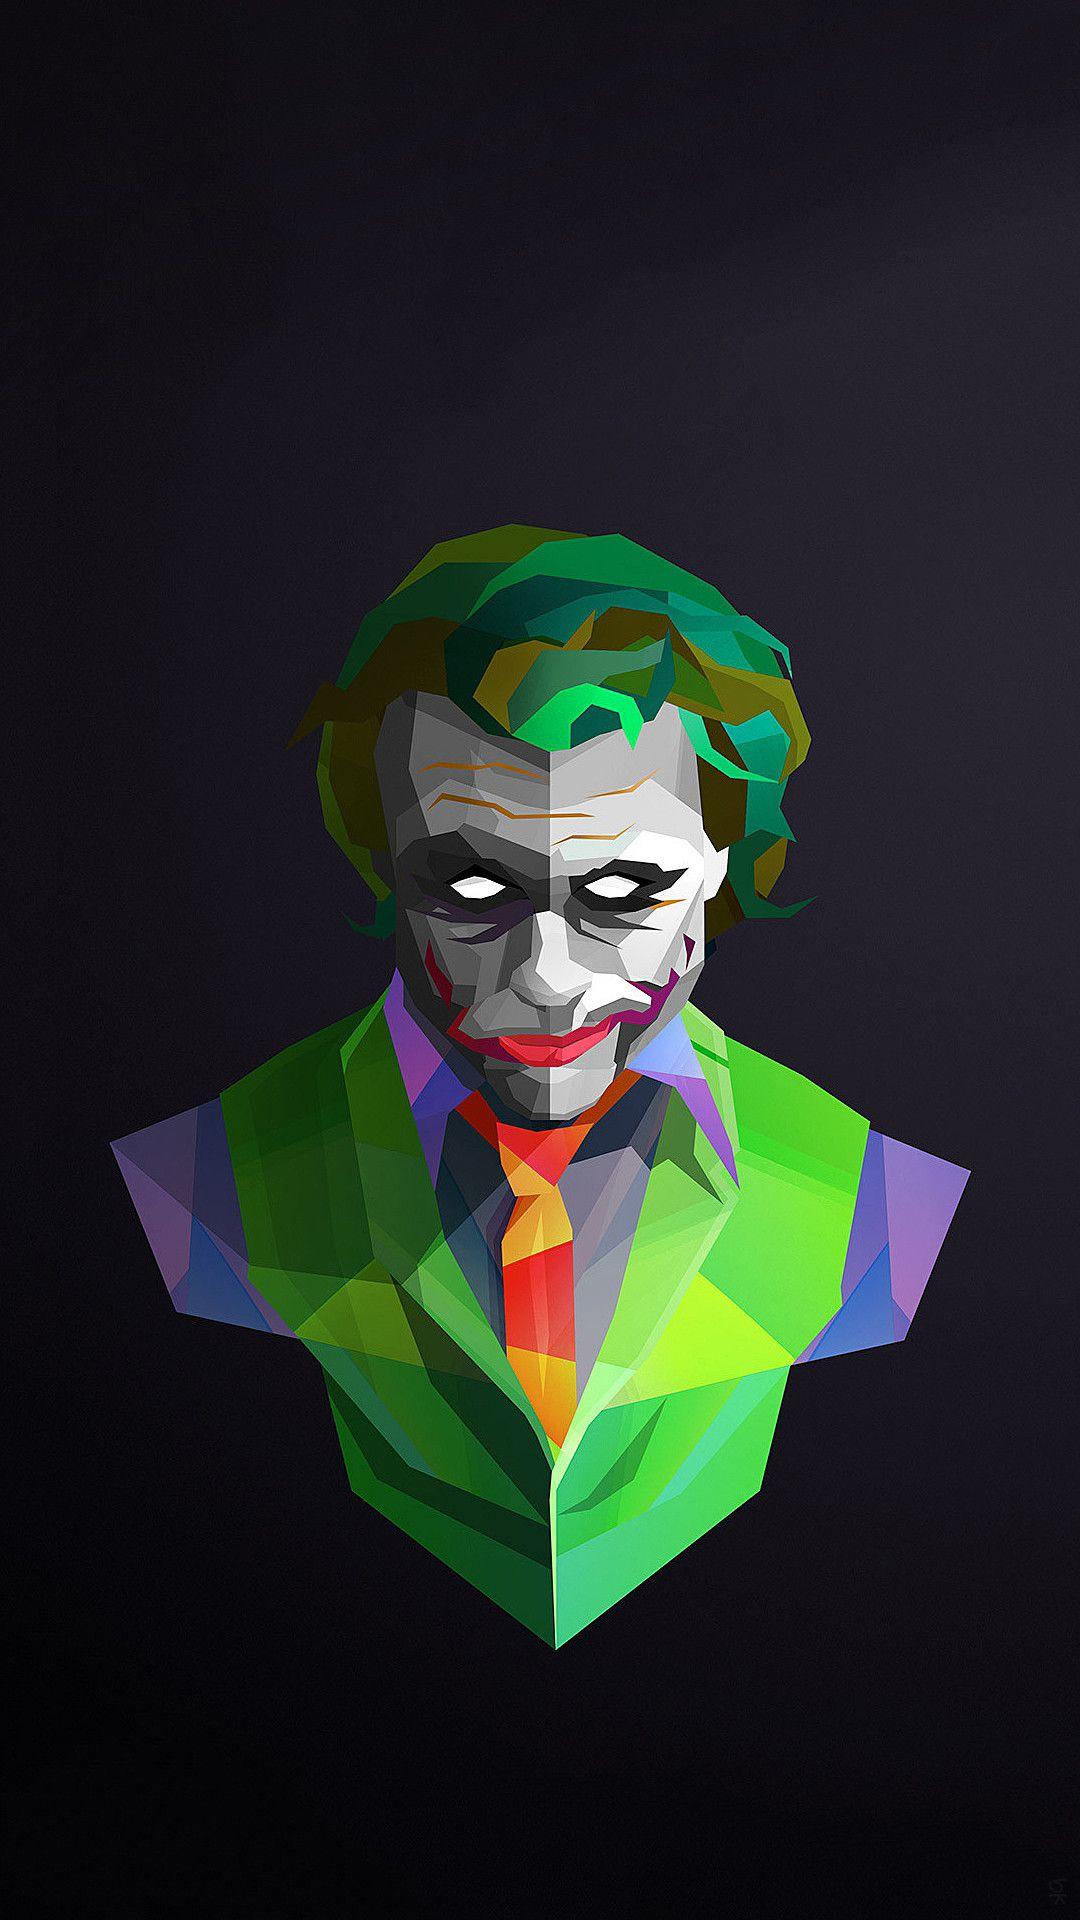 1080x1920 Best 25 Heath Ledger Joker Wallpaper Ideas Only On